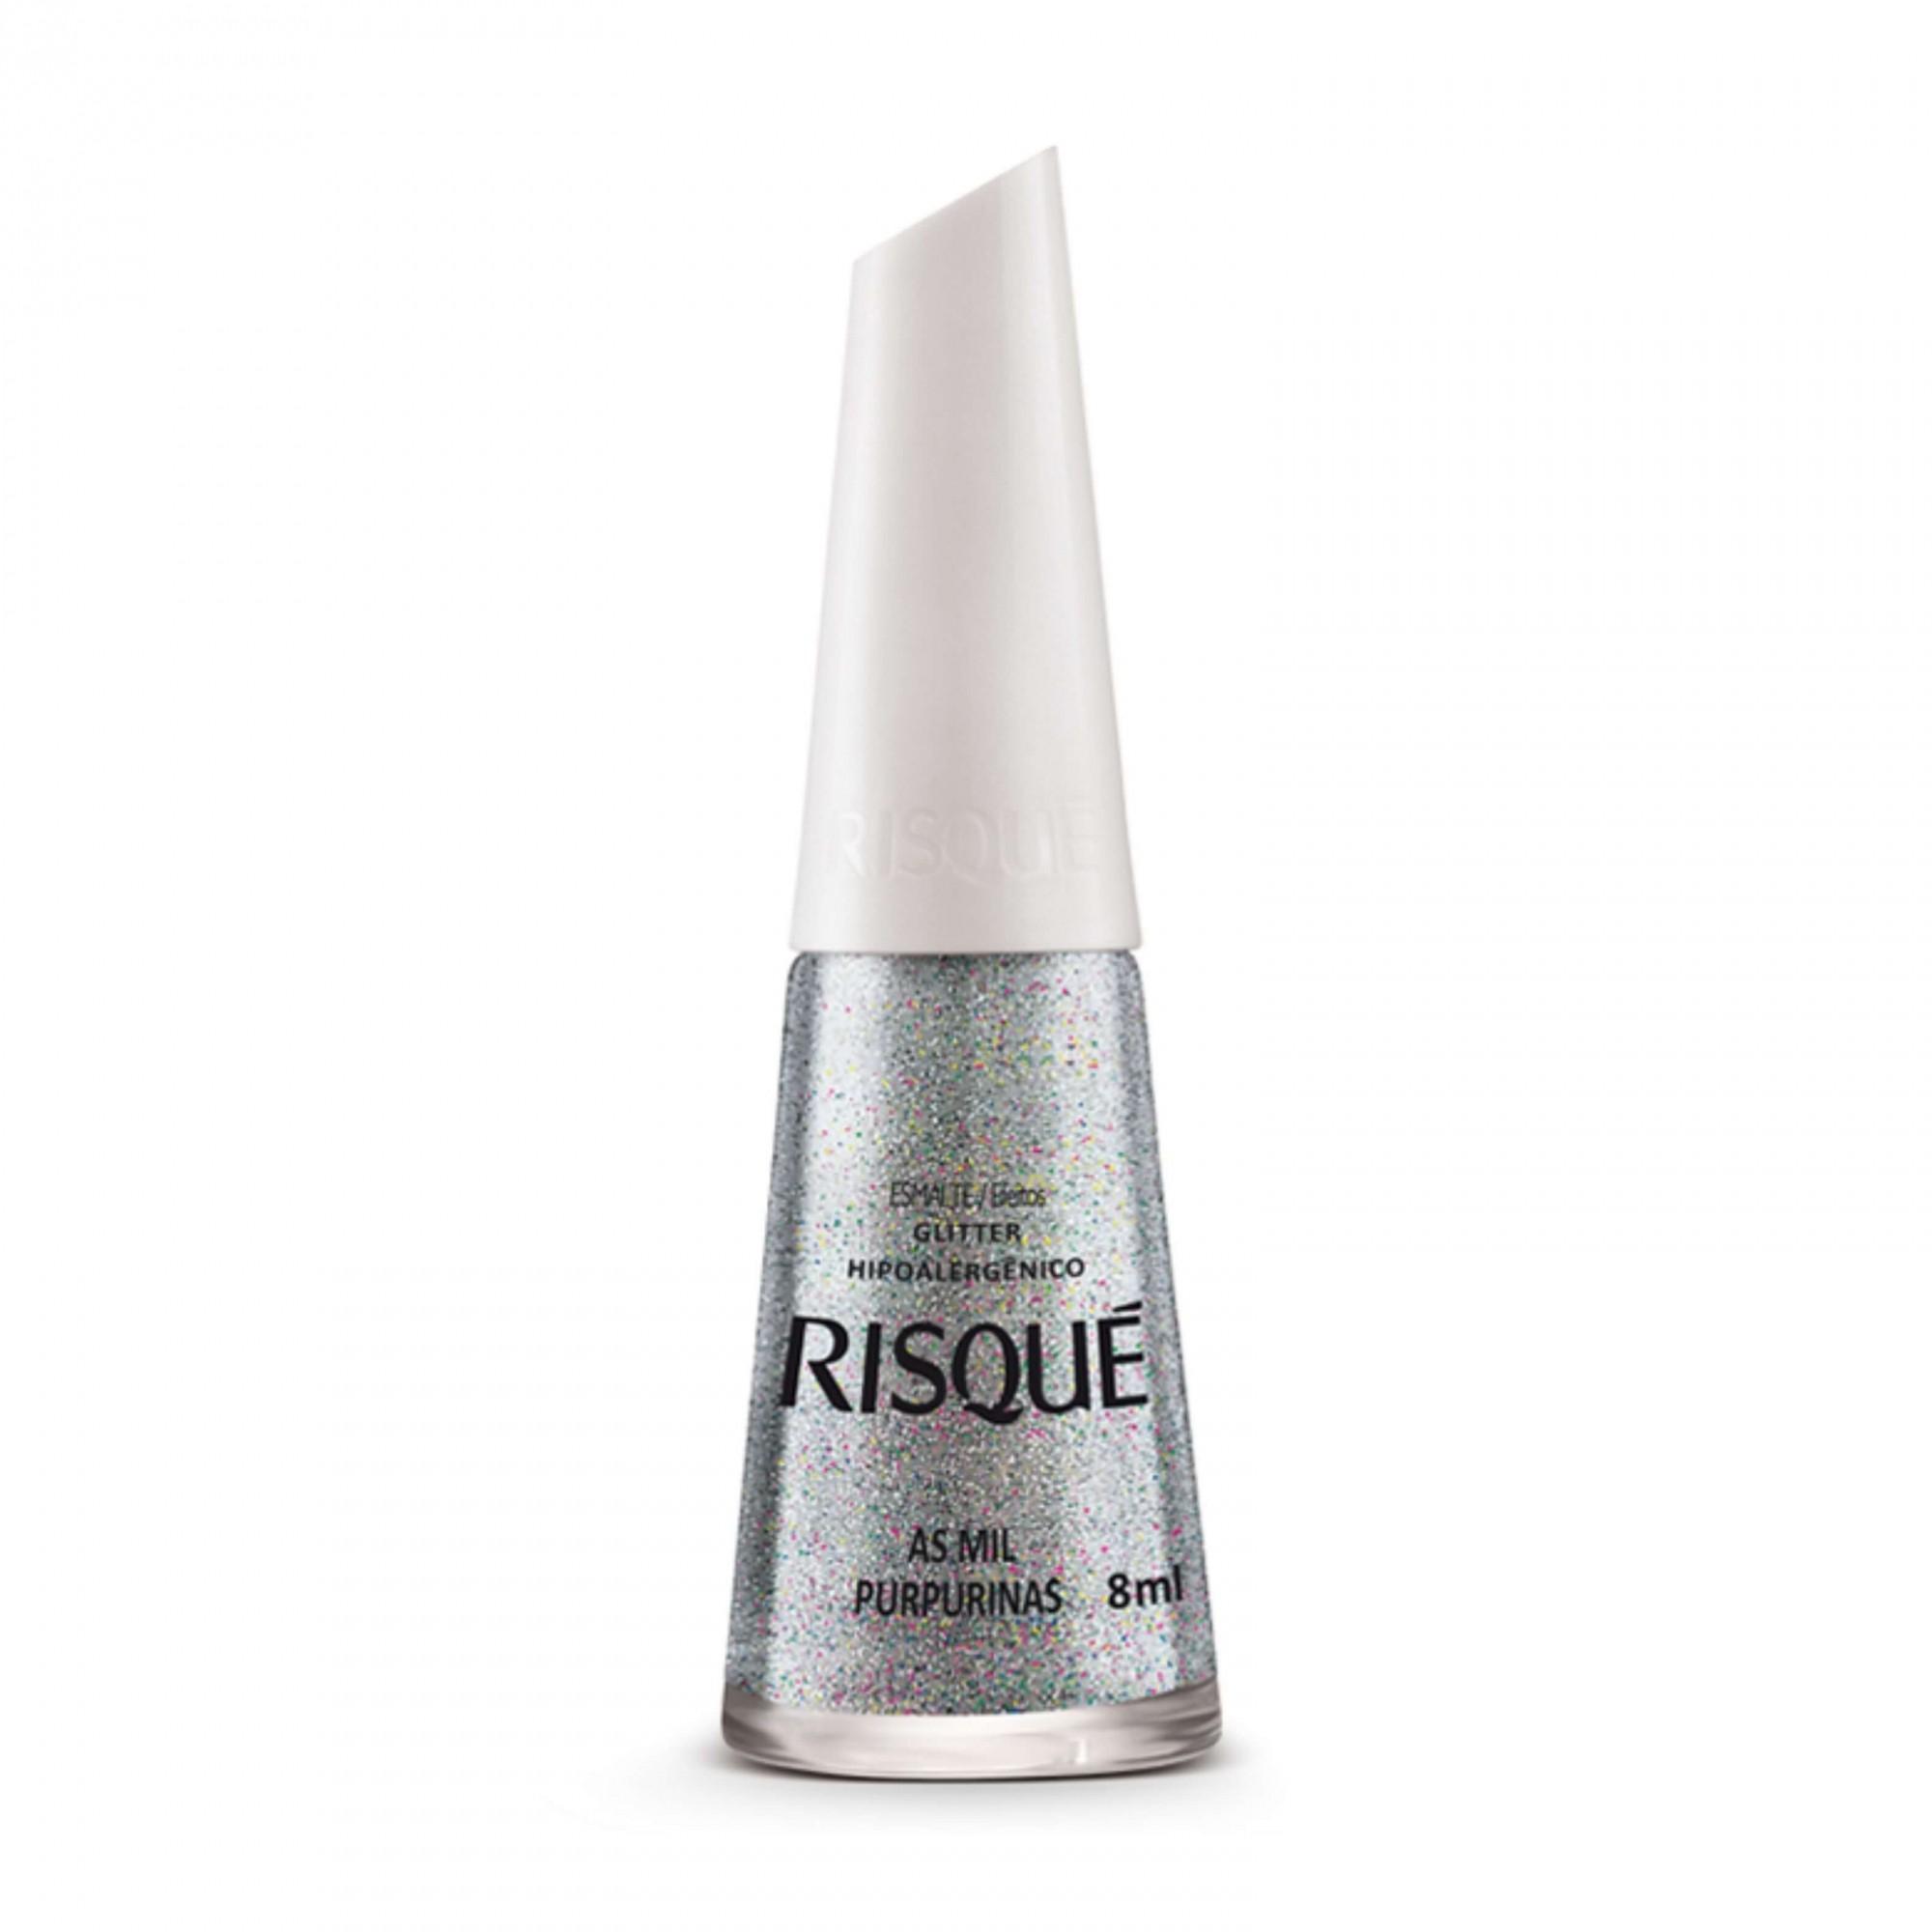 Esmalte Glitter Risque As Mil Purpurinas 8ml